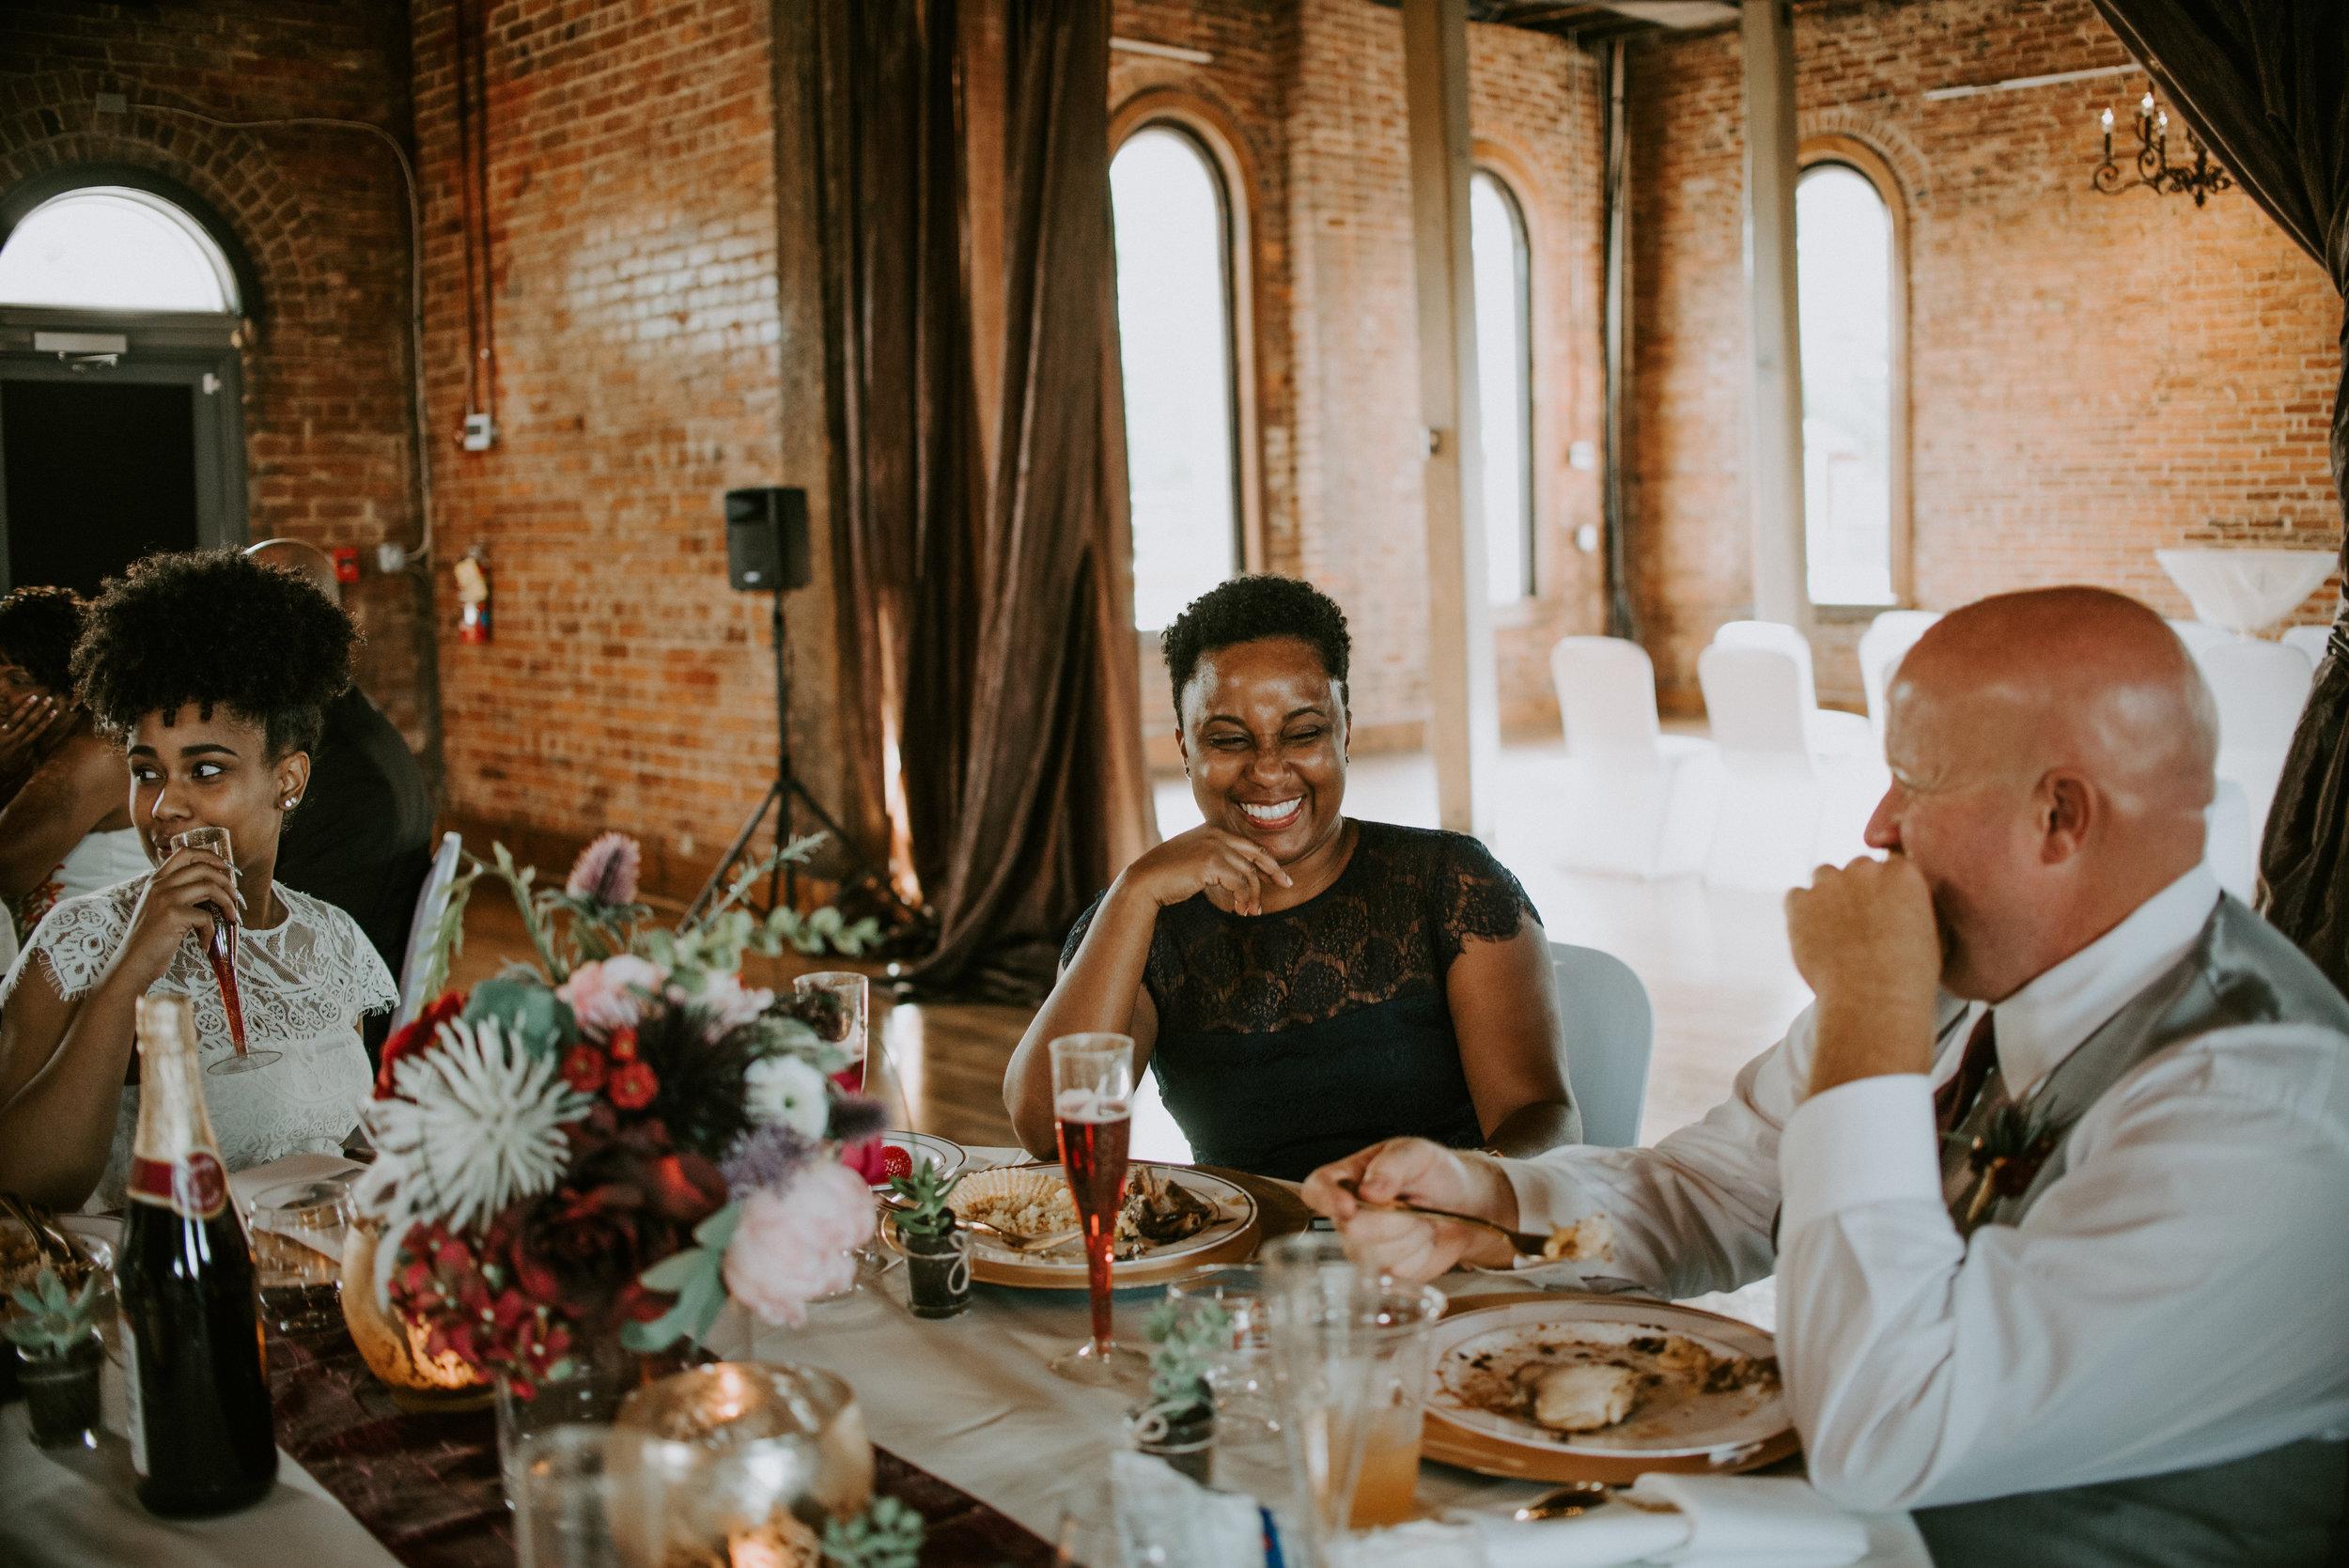 WonderlyCreative_Wedding_6.7.18_Khara&Dwayne_-882.jpg